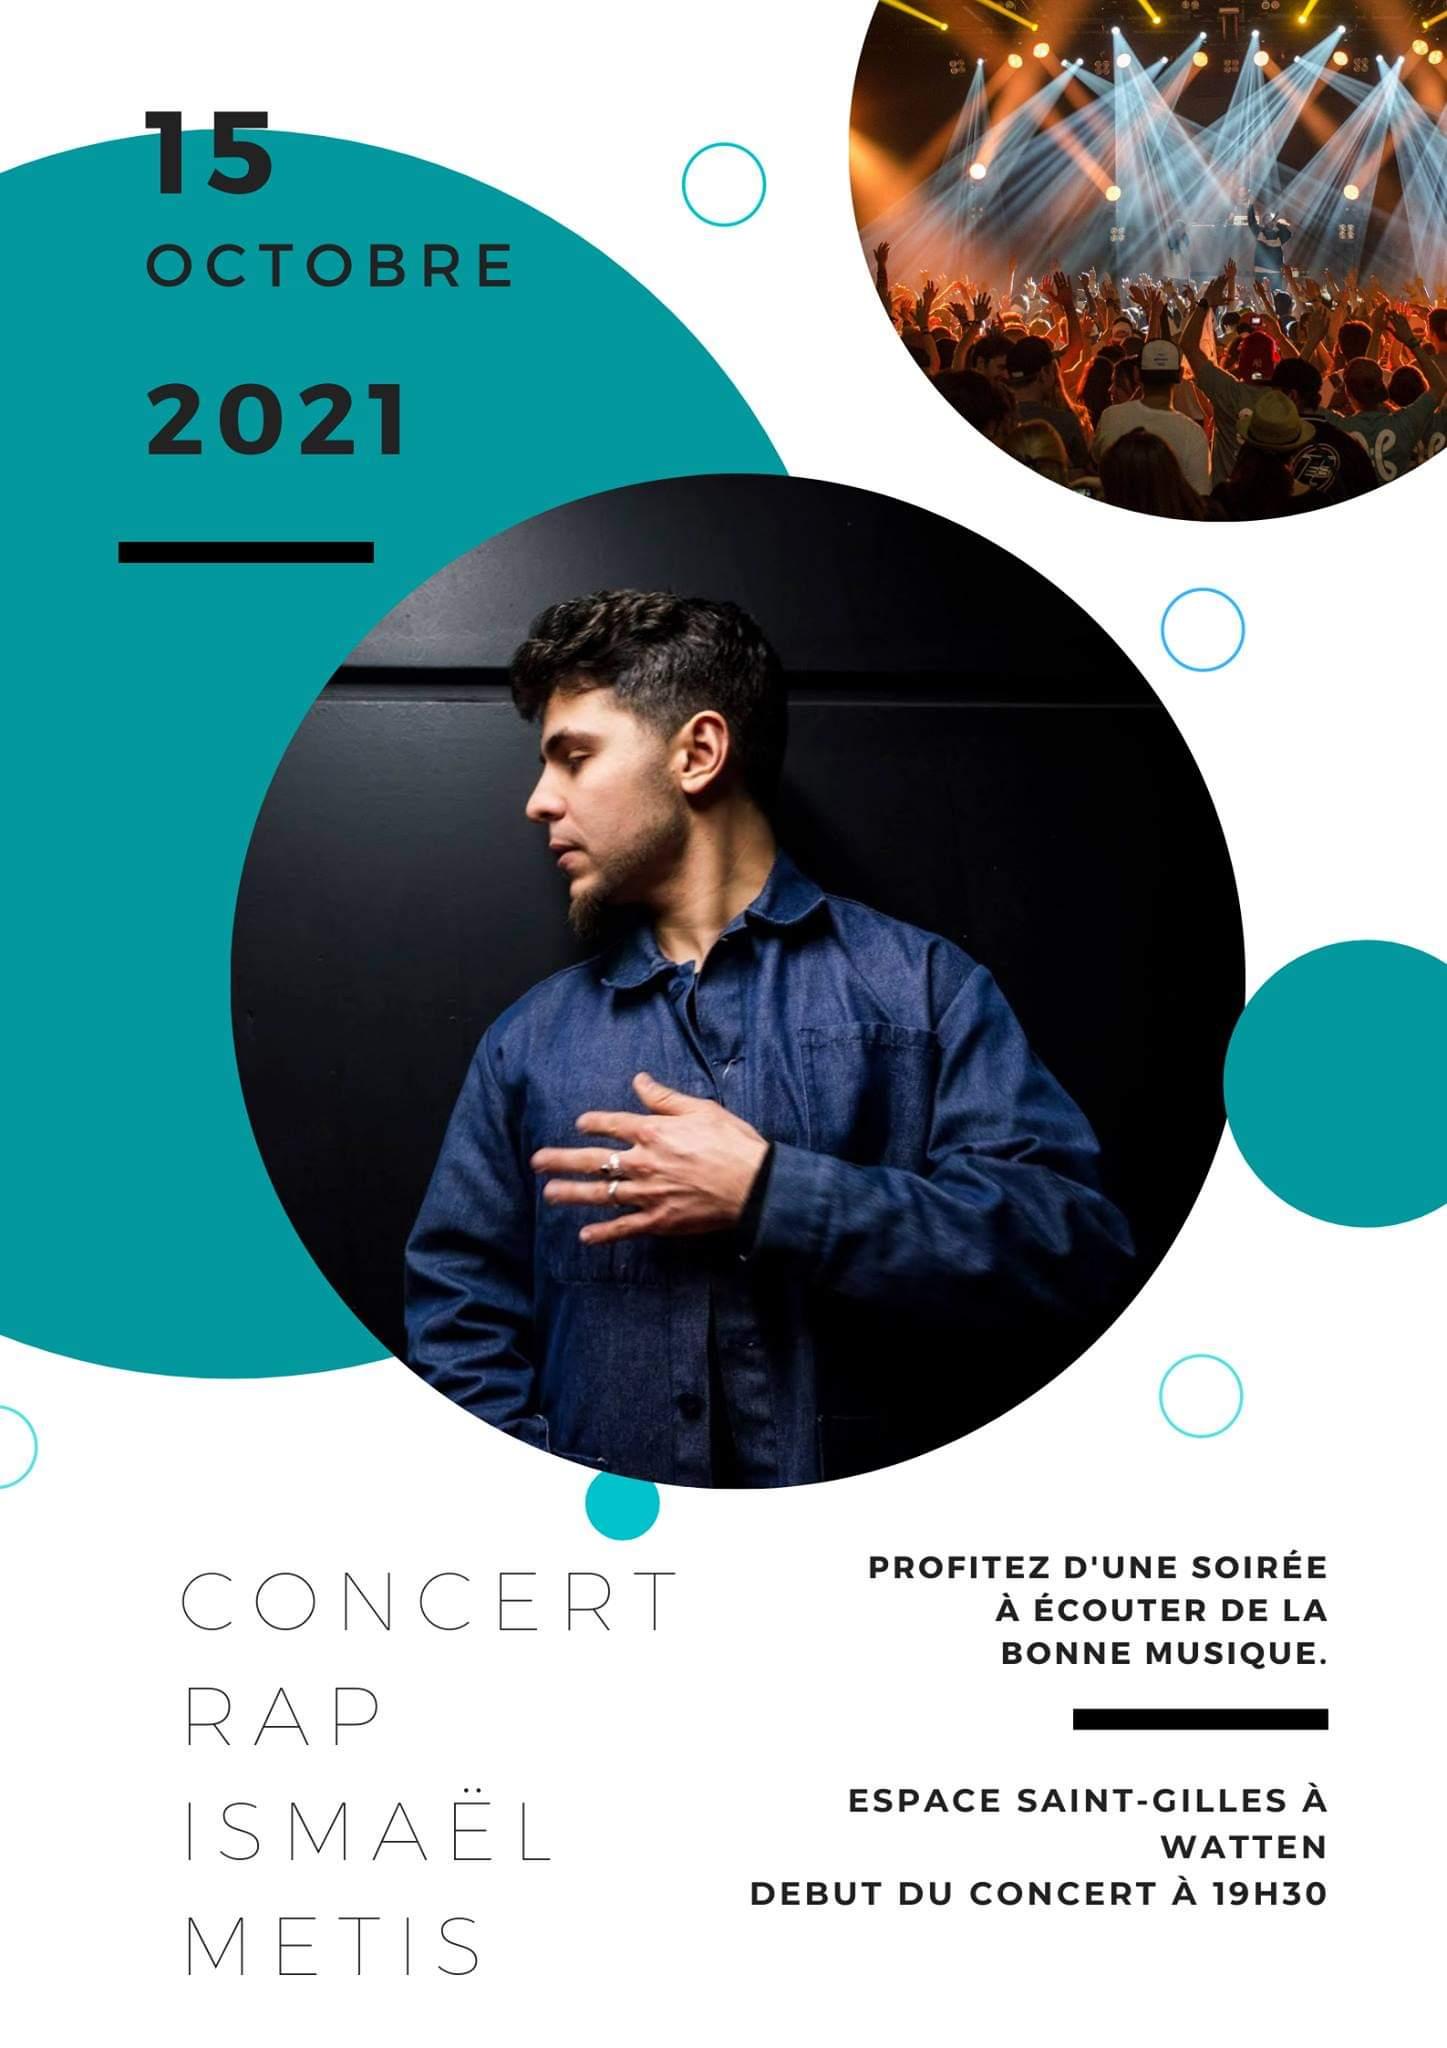 2021-10-15_concert_ismael_metis.jpg